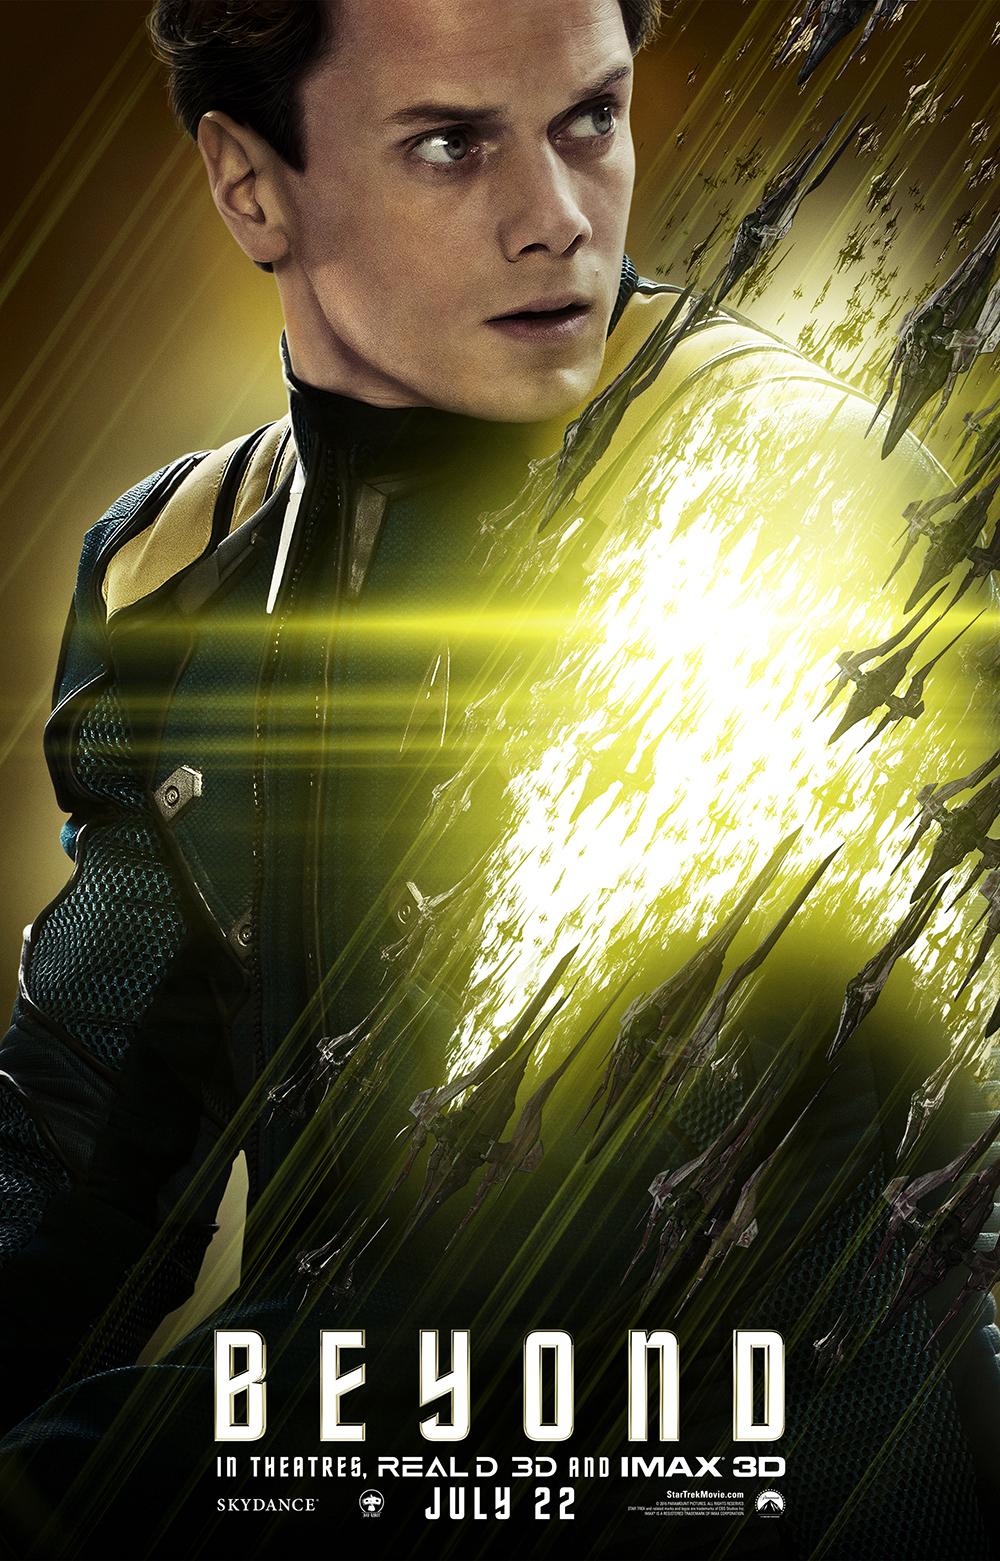 """Star Trek Beyond"" theatrical teaser poster featuring Chekov."